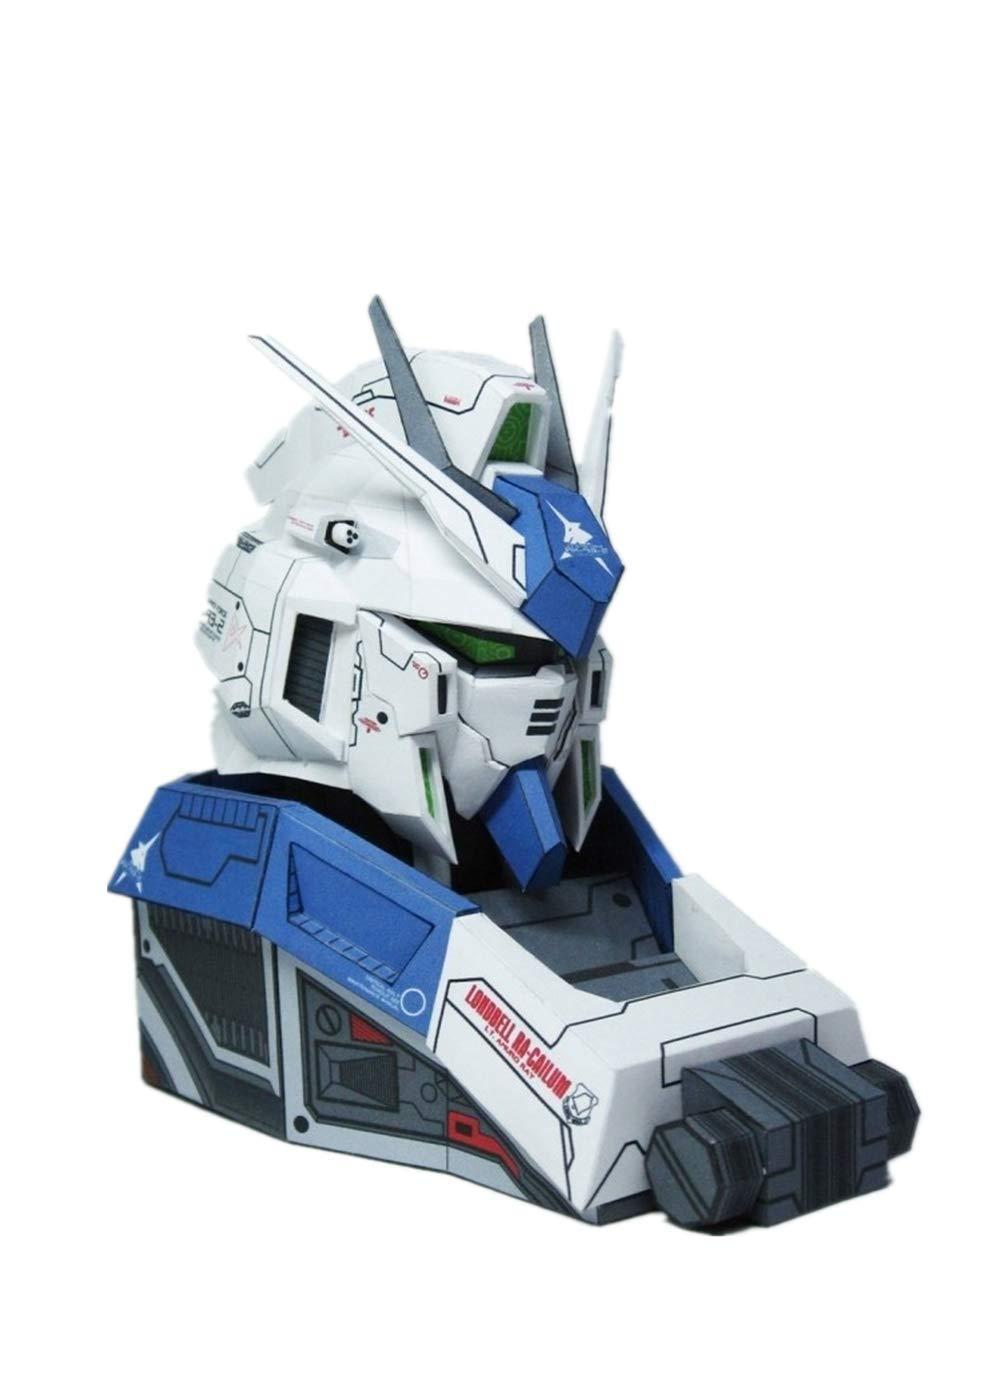 Amazon com : RX-93-2 HI-V Manatee Gundam Bust Paper 3D Model